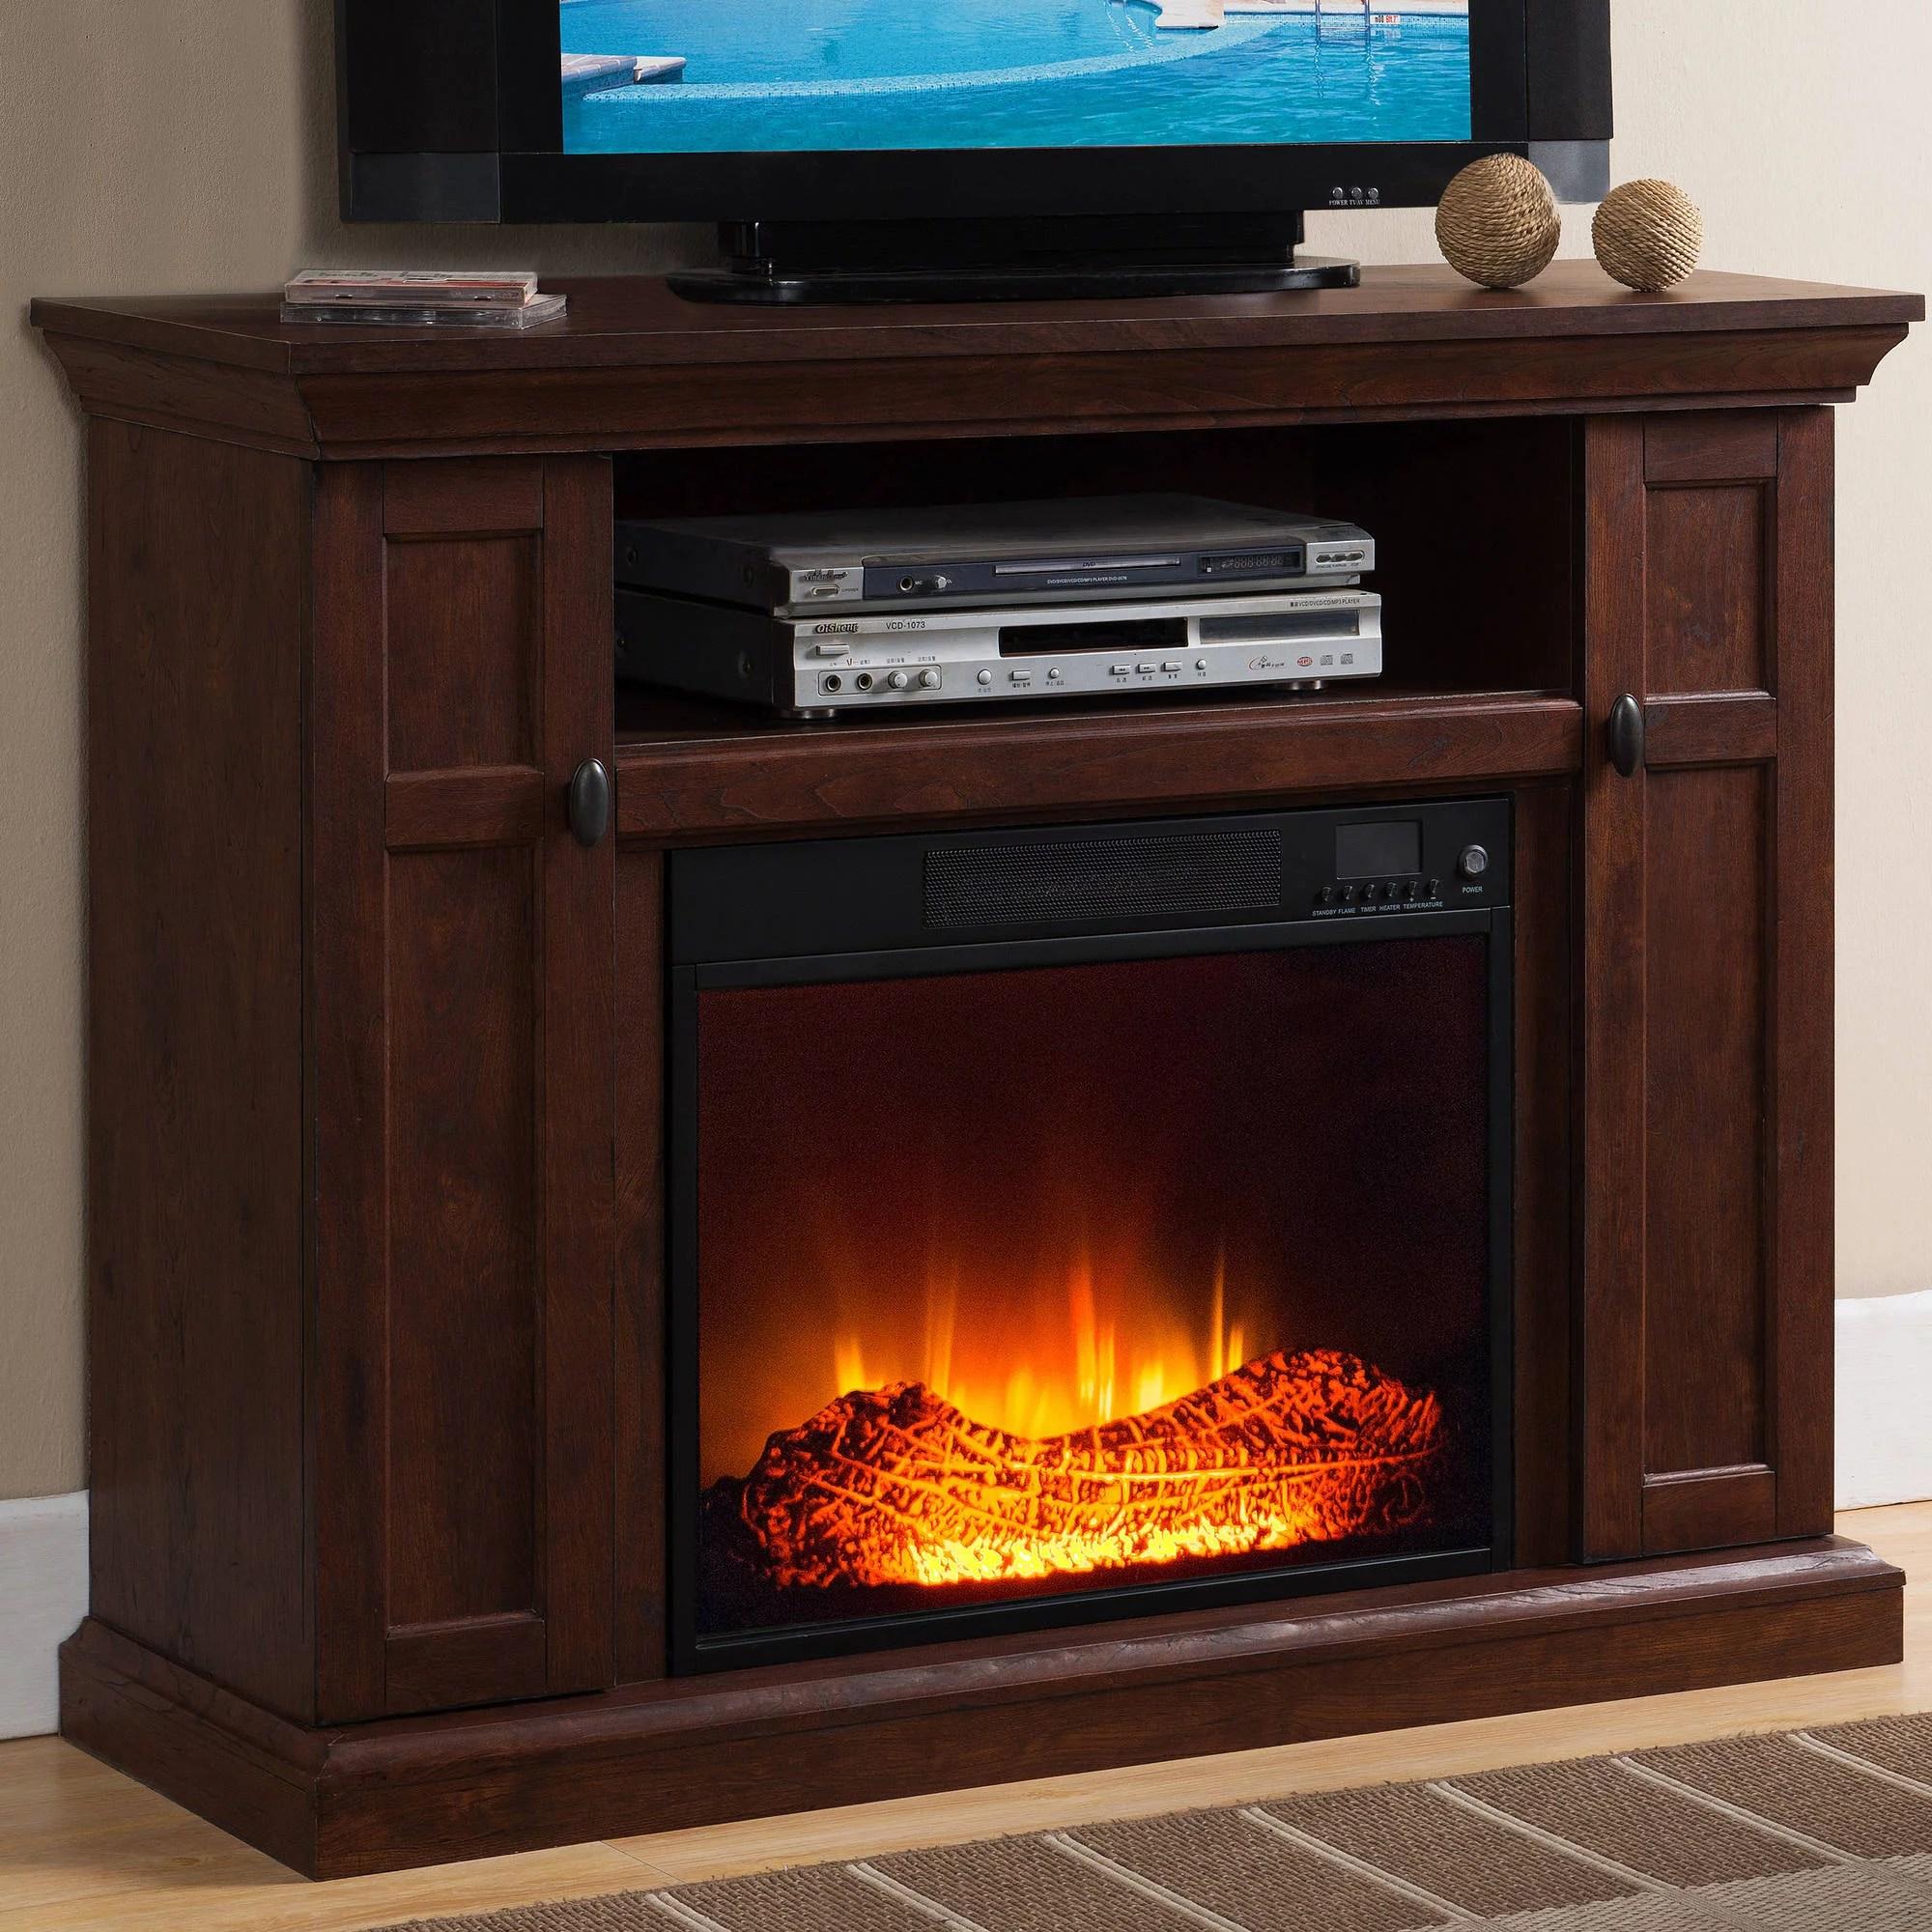 Prokonian Electric Fireplace with 46 Mantle with Storage WQ001 Cherry  Walmartcom